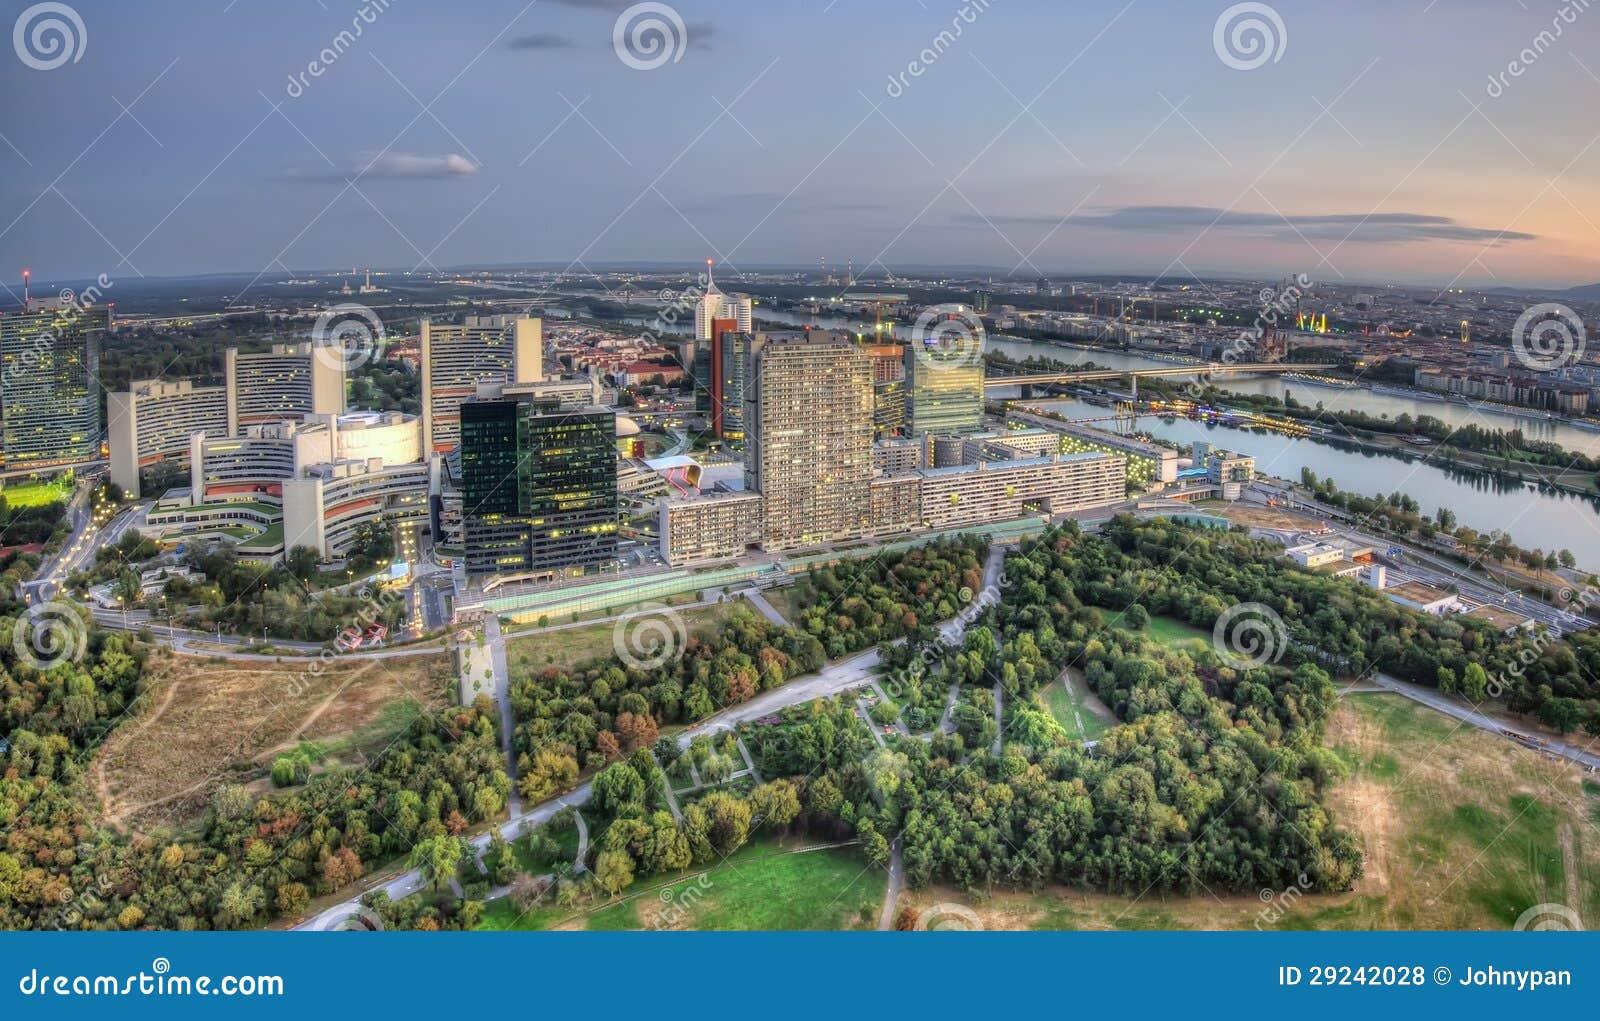 Download Viena foto de stock. Imagem de greenery, estrada, crescimento - 29242028